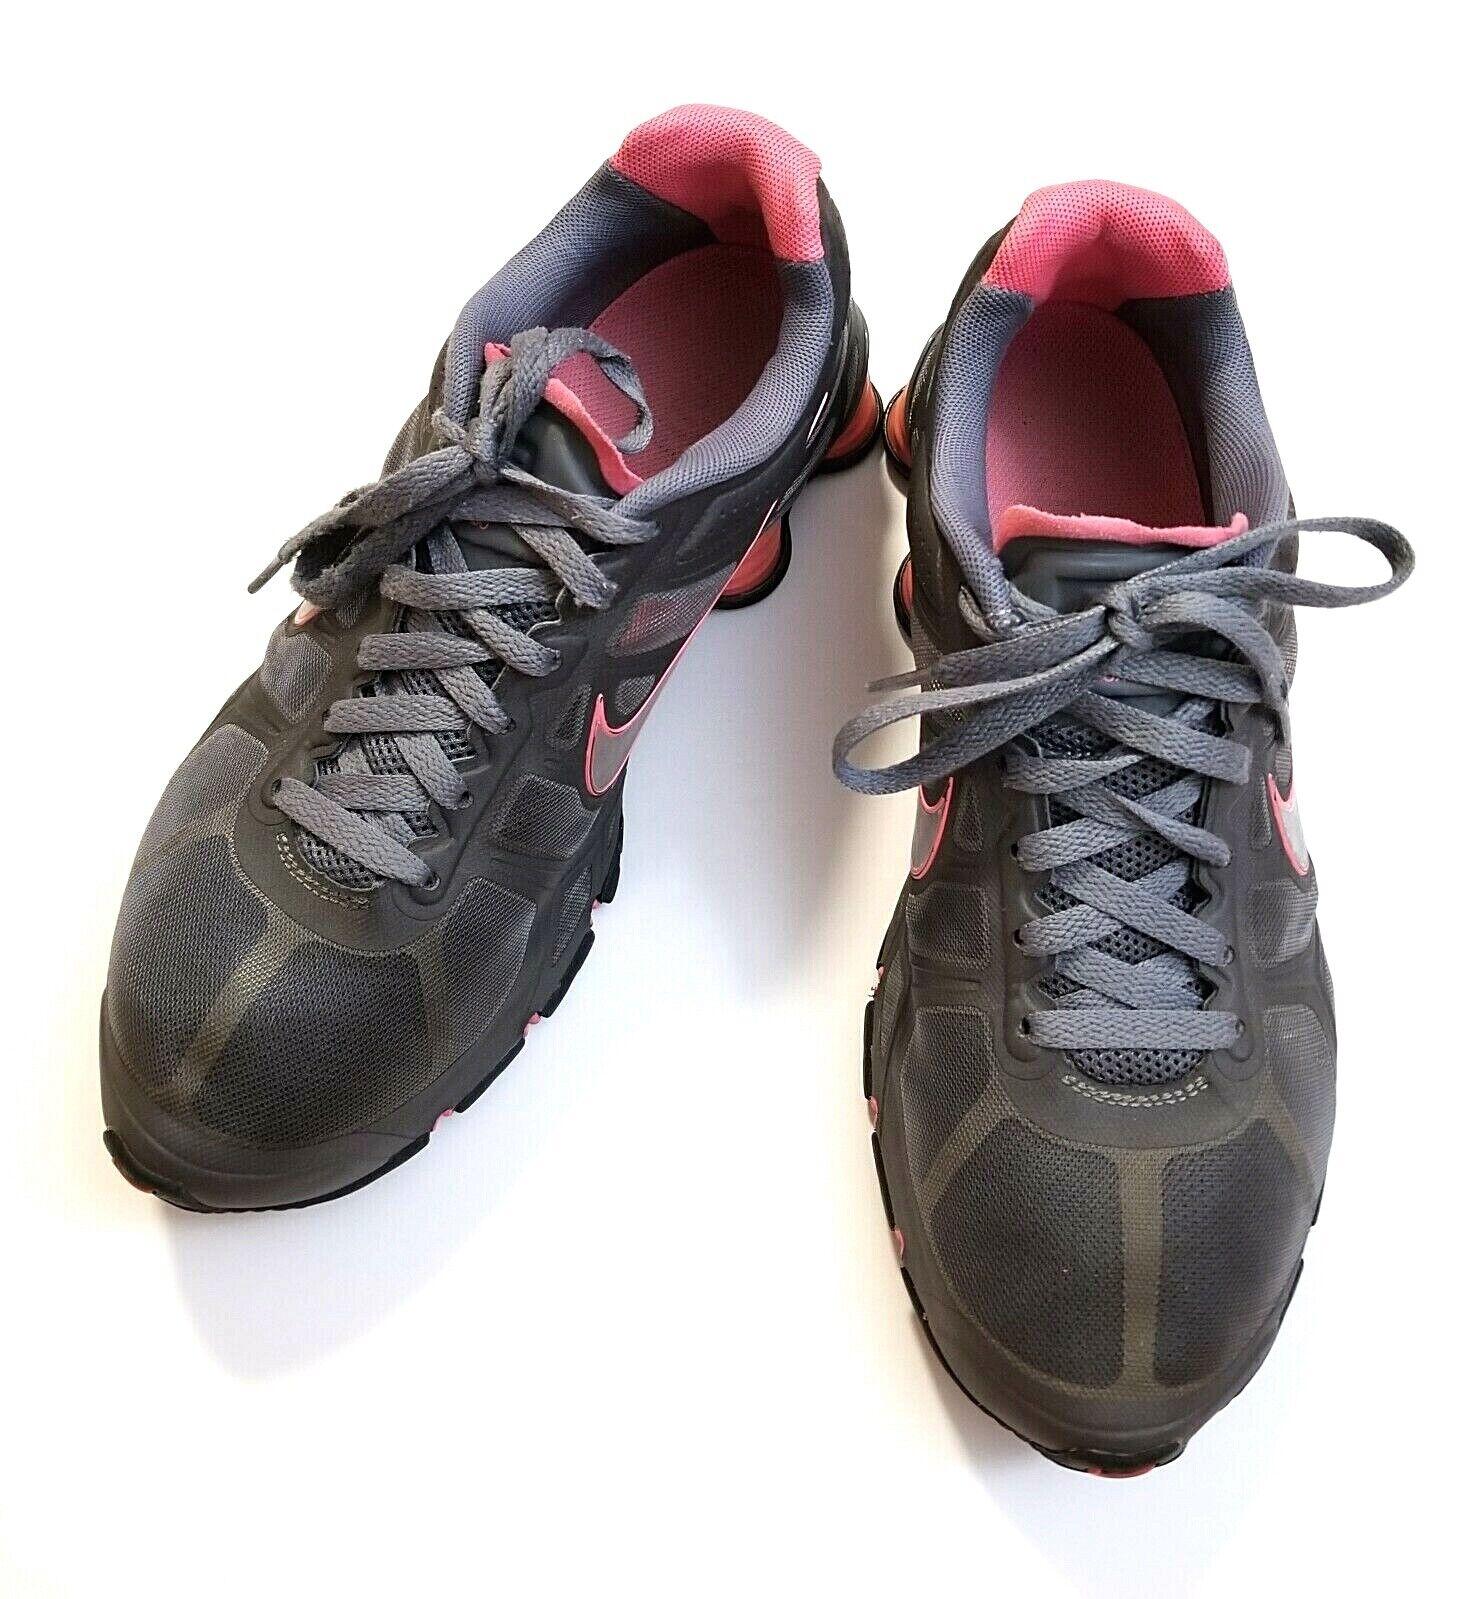 womens nike shox agente Nike Shox Agent Womens Pink Spark Grey iPod Ready Running Shoes ...